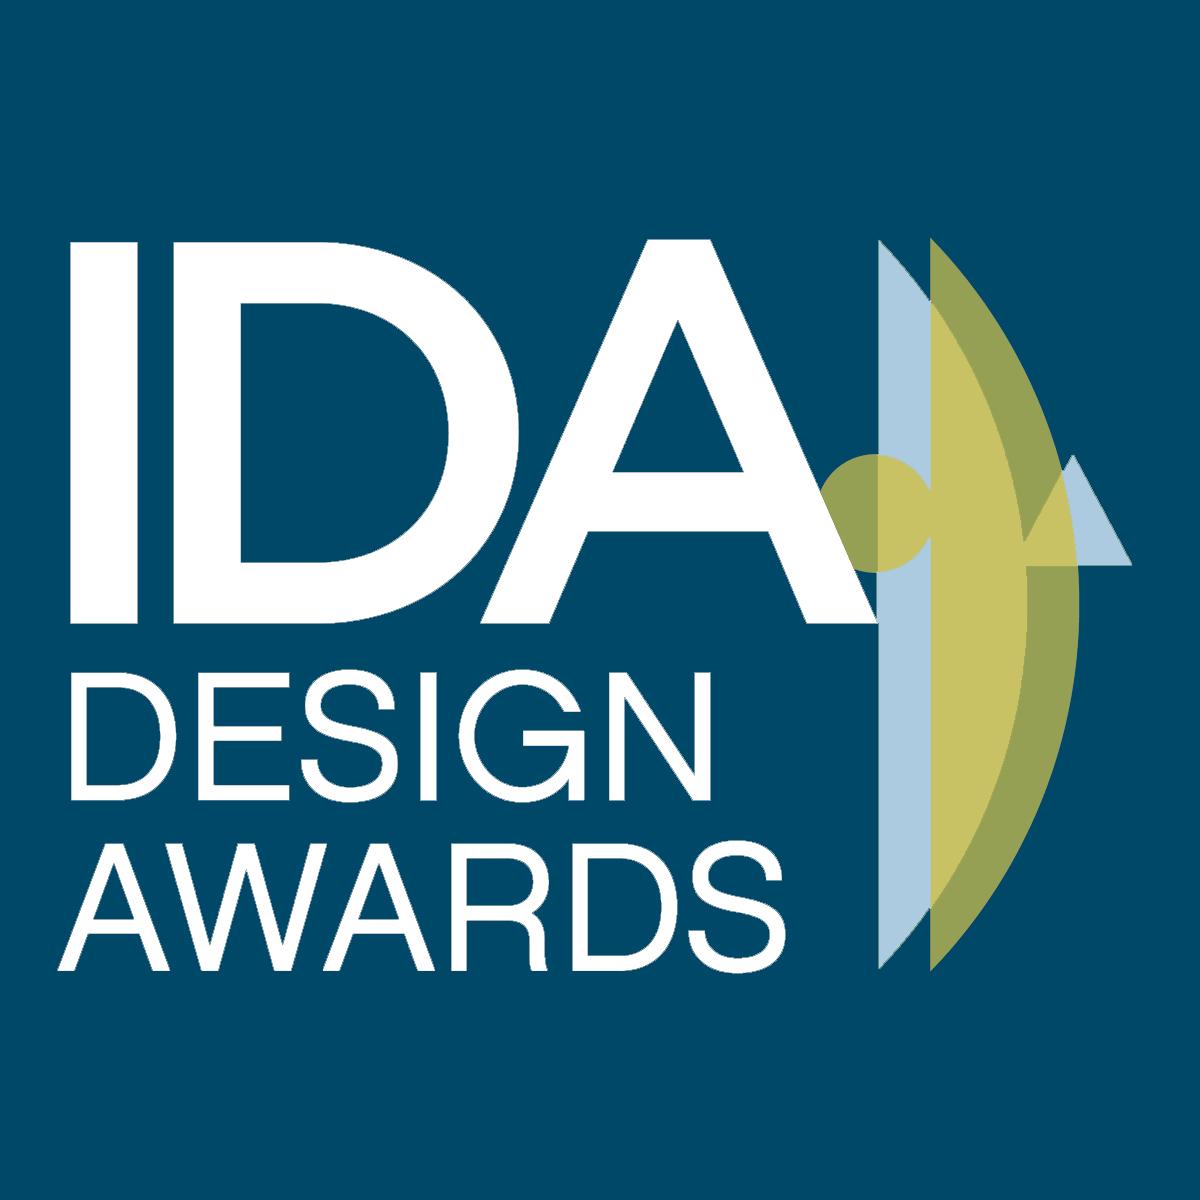 (IDA) International Design Awards